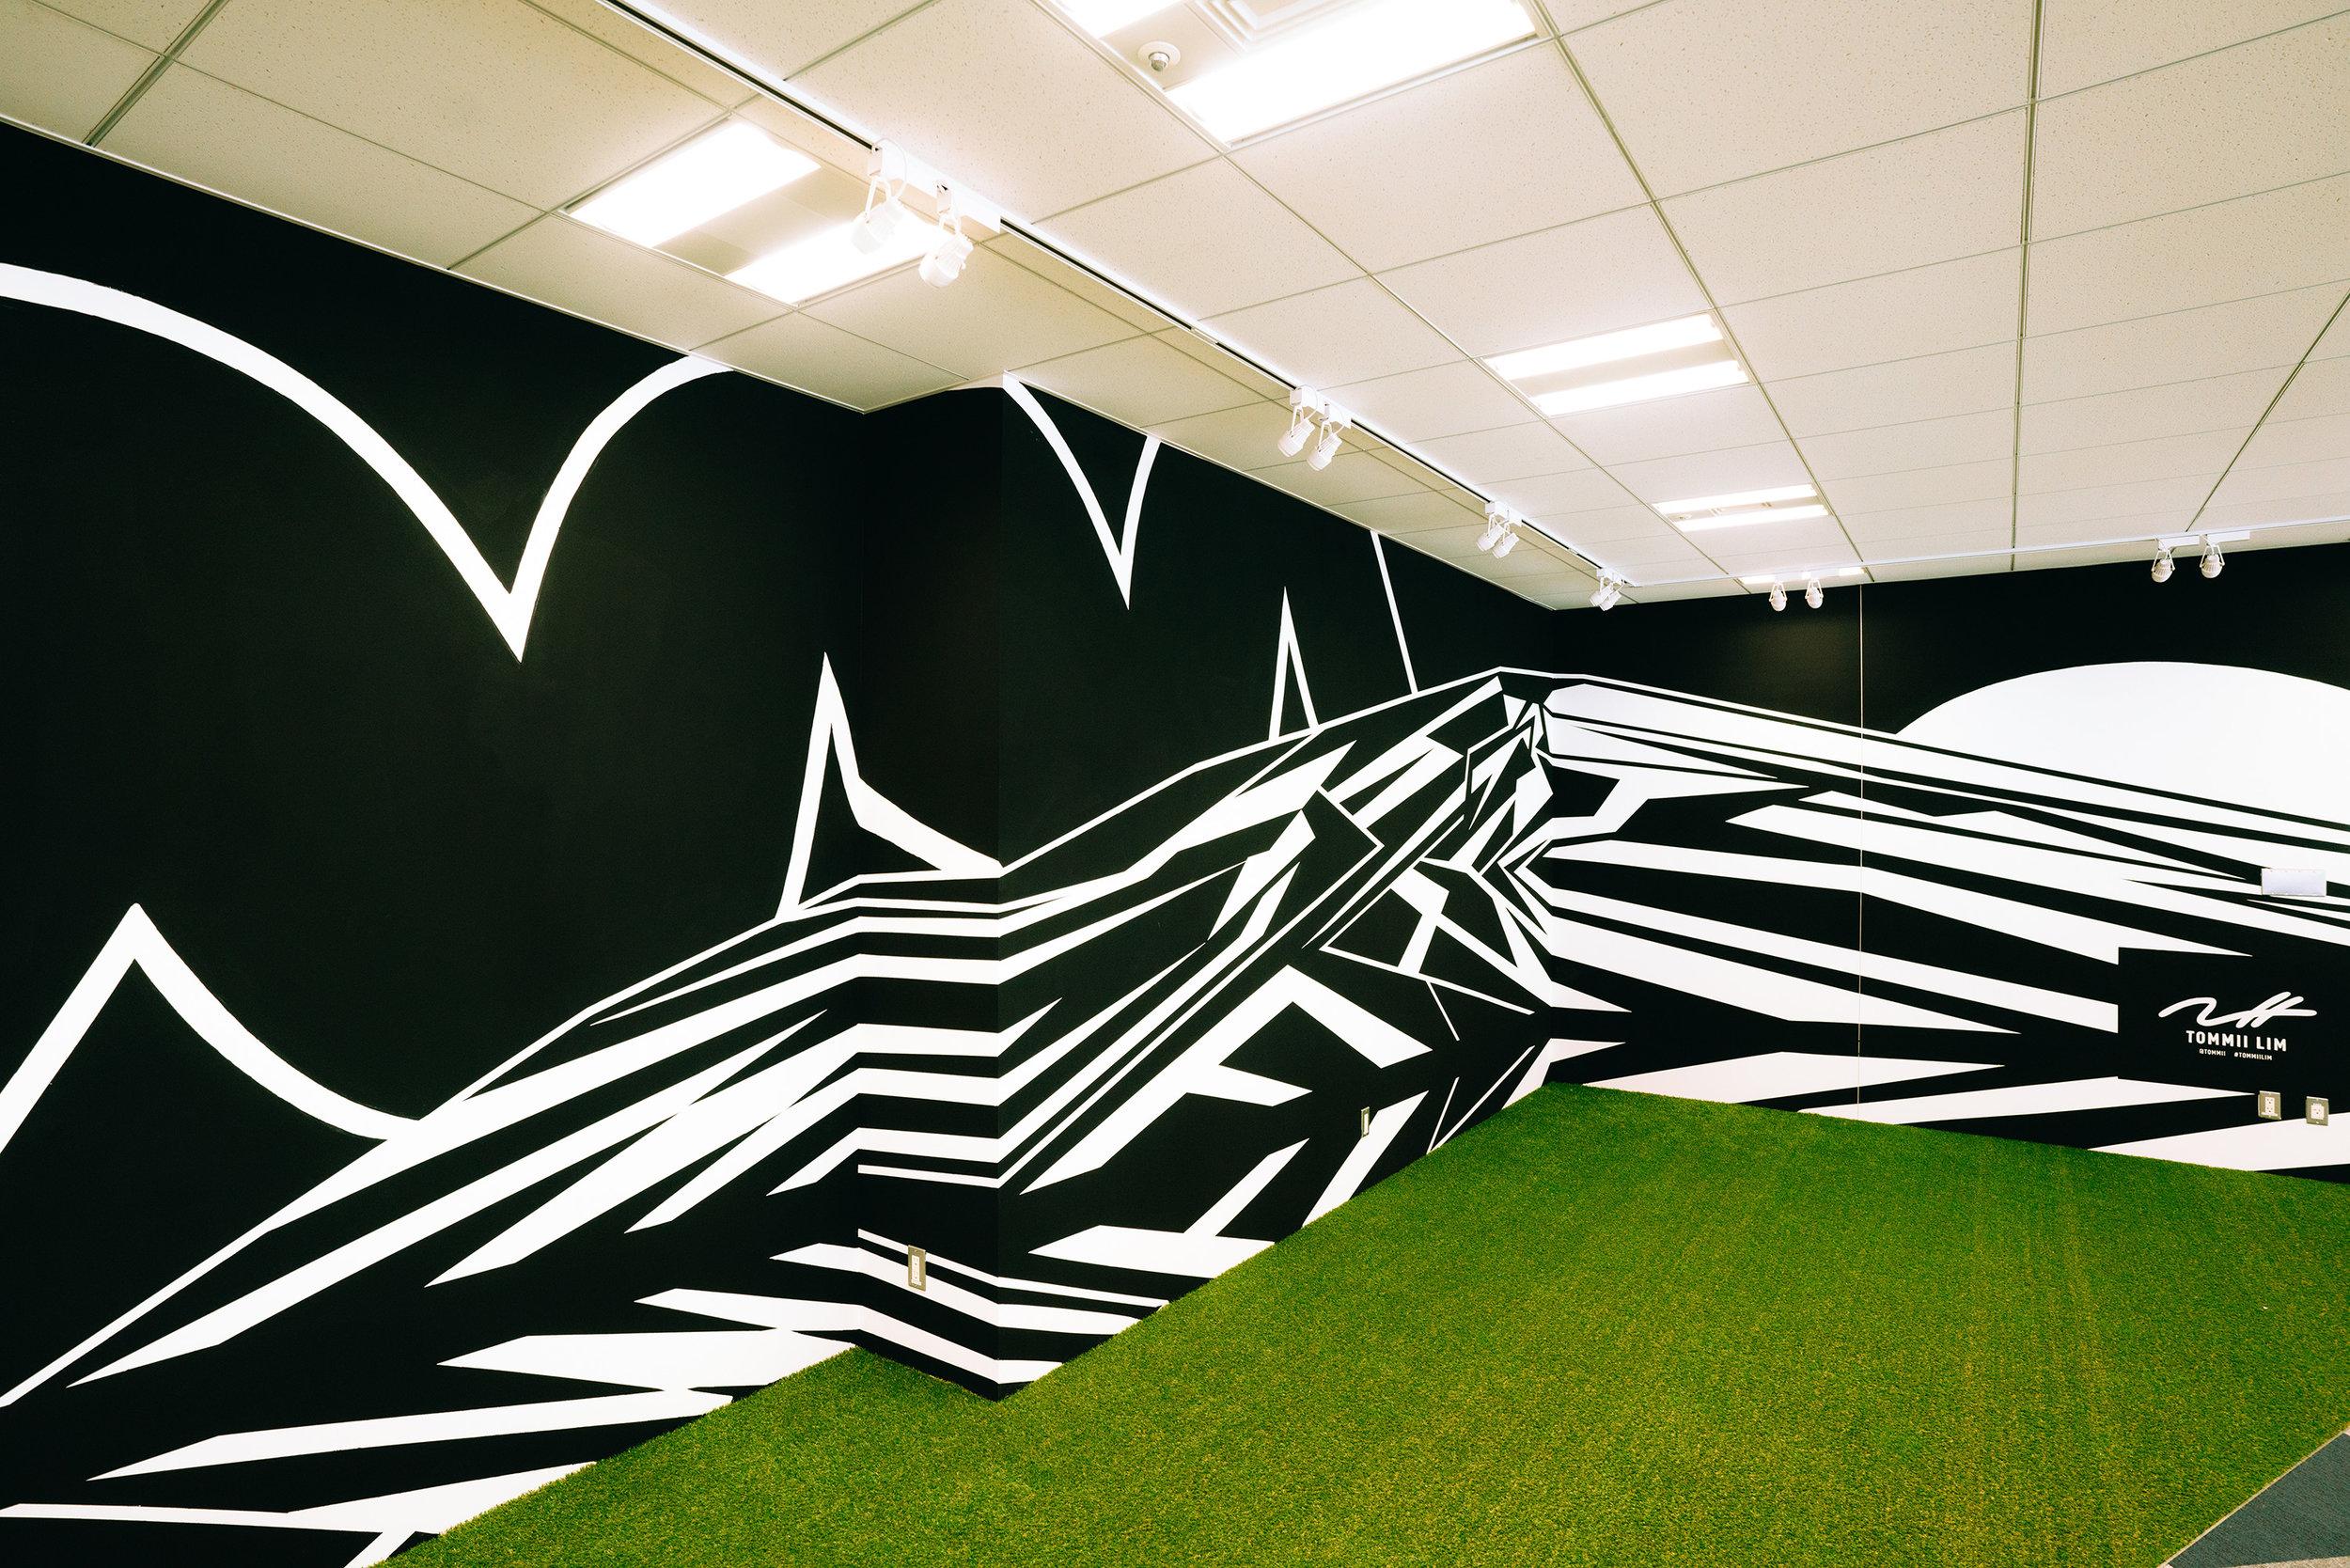 mark lona mural japan-20.jpg